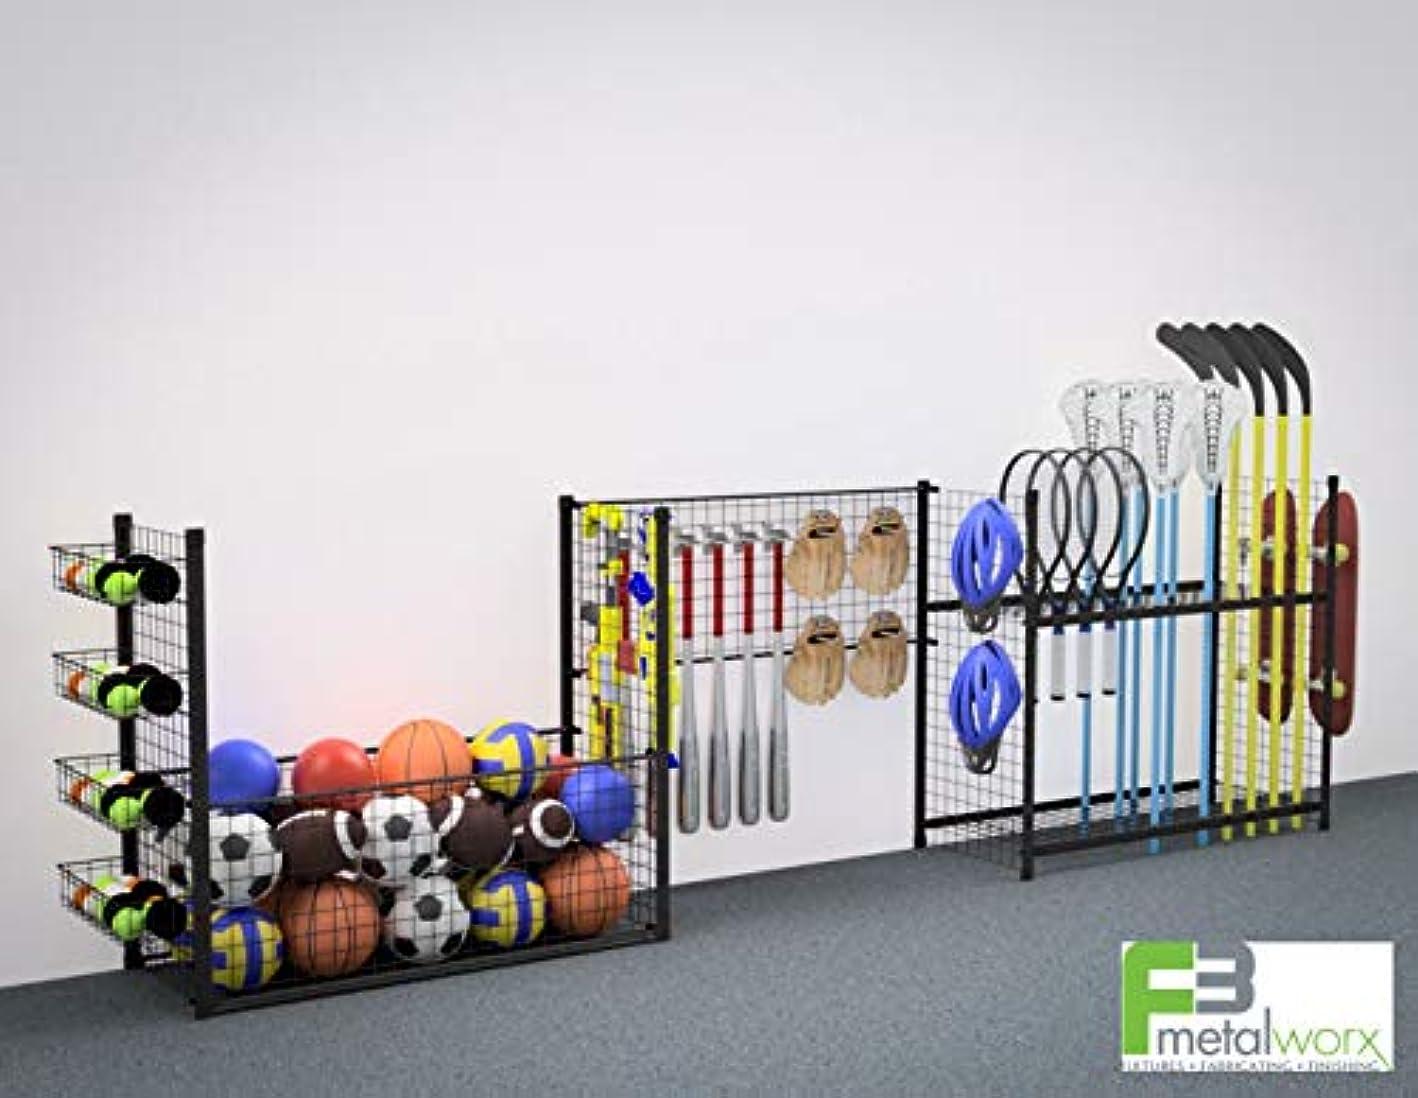 Flexworx Athletic Storage, Sporting Goods Storage, Home Organization, Garage Shelving, Athletic Storage